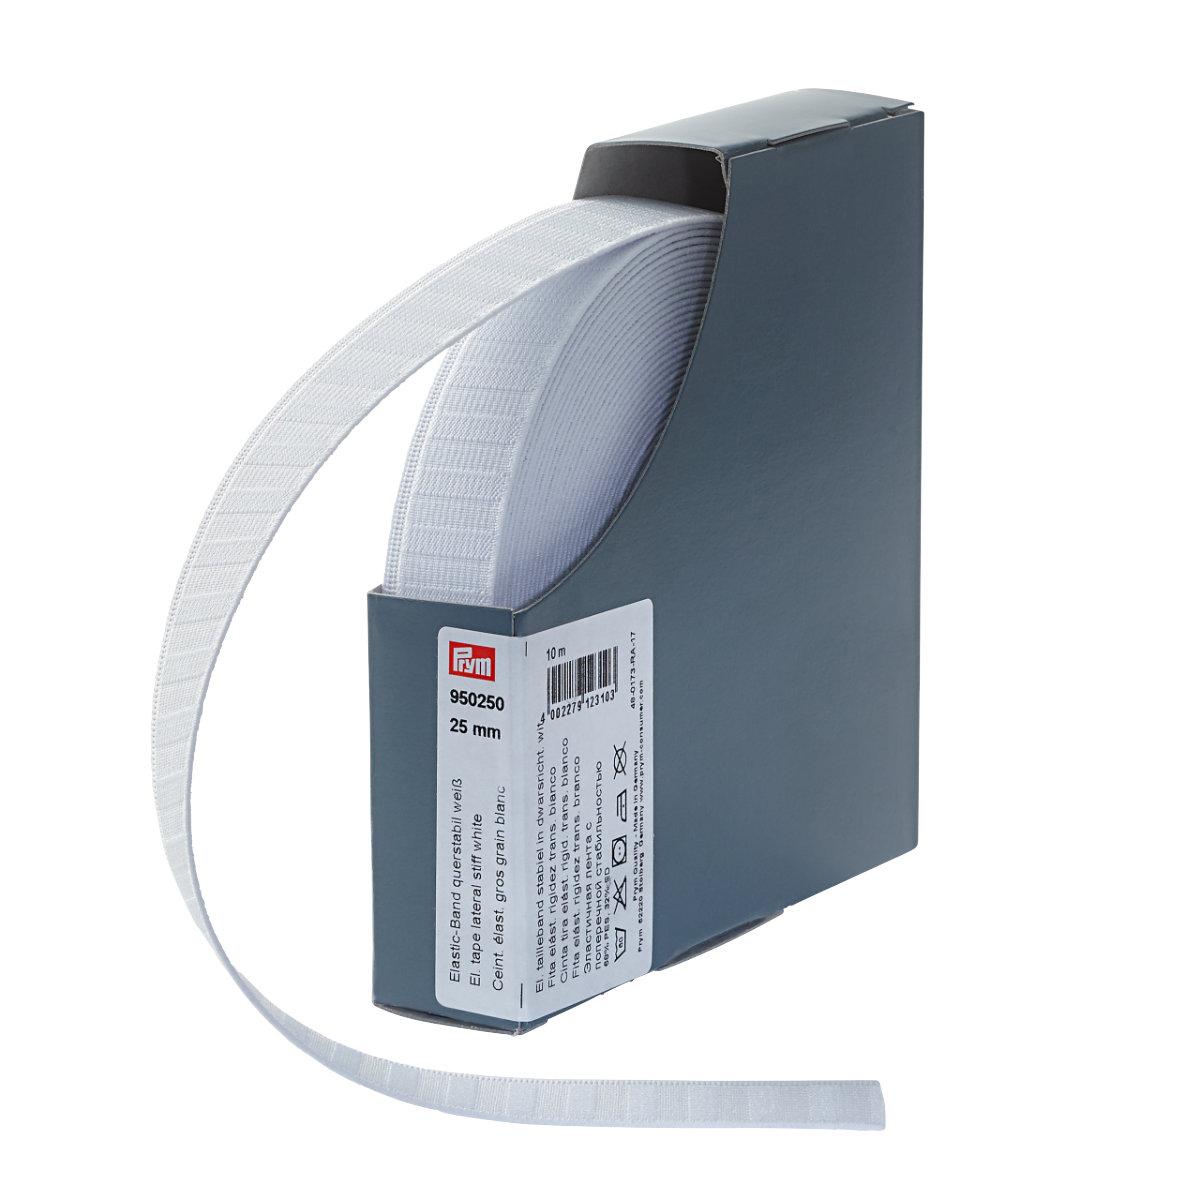 Prym 950250 Elastic-Band querstabil 25 mm wei/ß 68/% PES 32/% ED